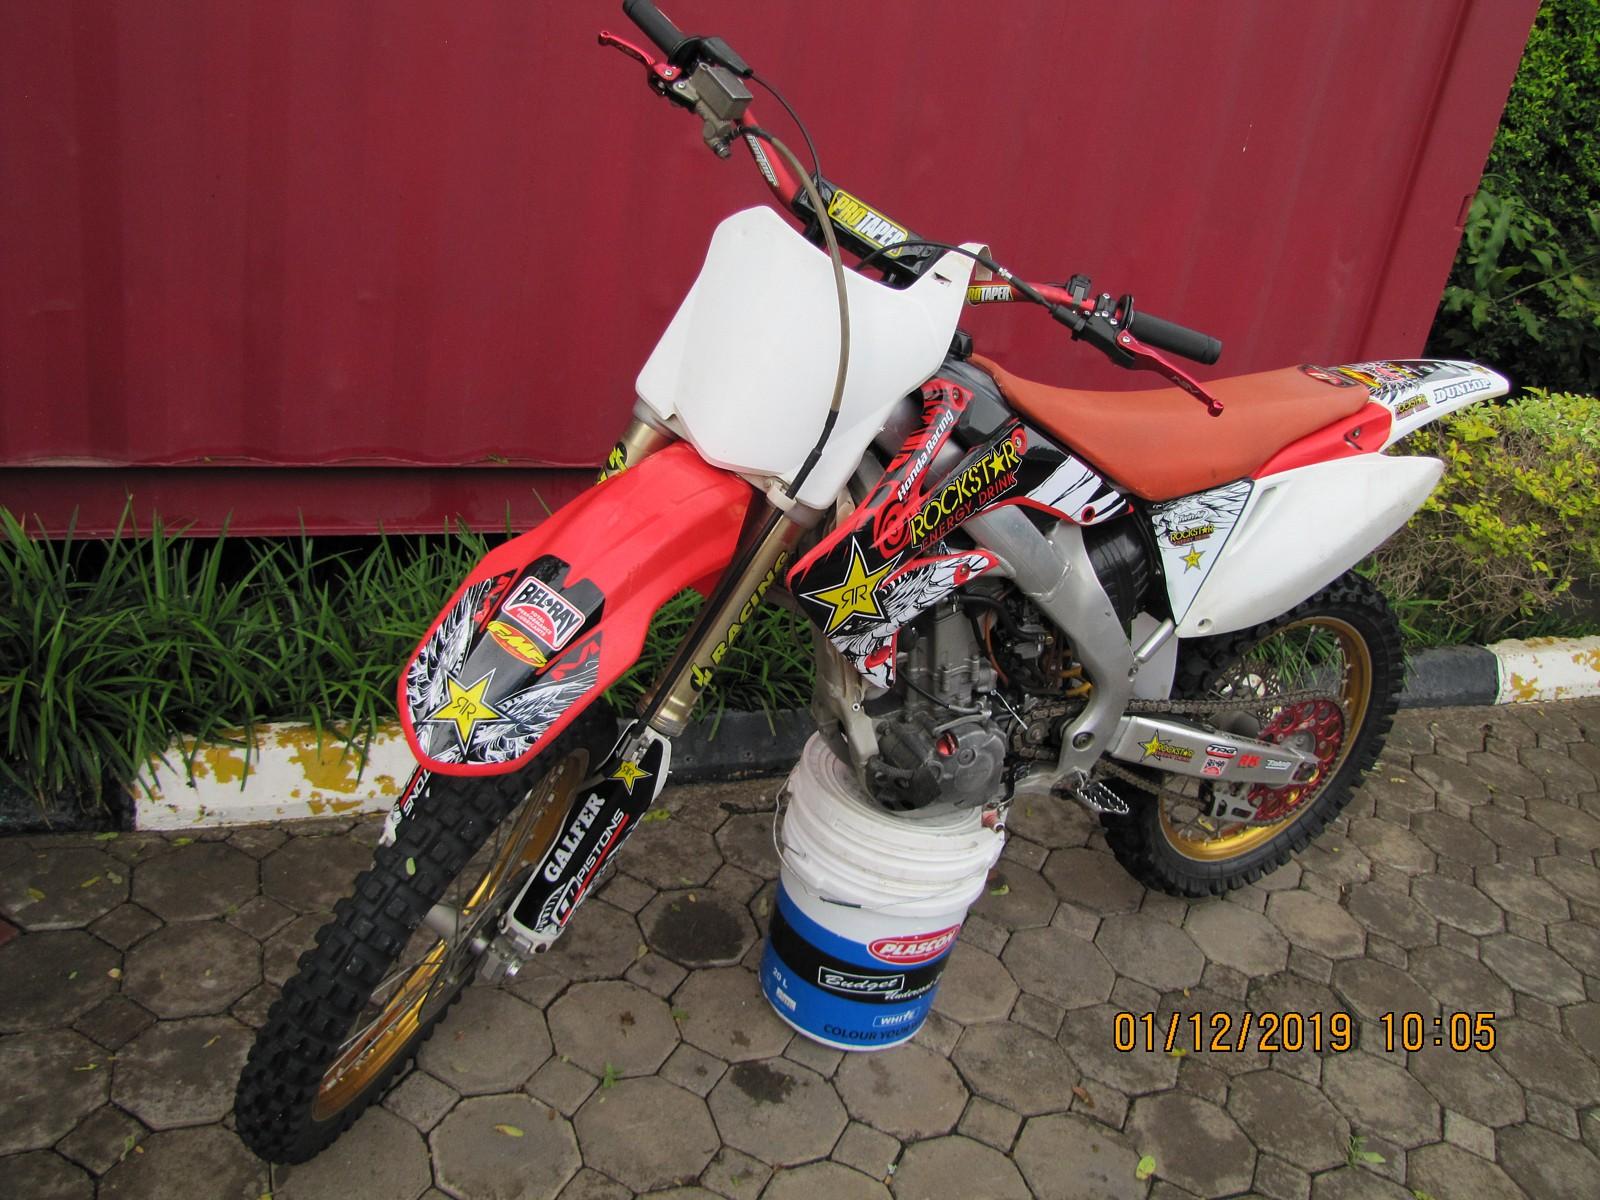 IMG 0027 - banny wailer - Motocross Pictures - Vital MX